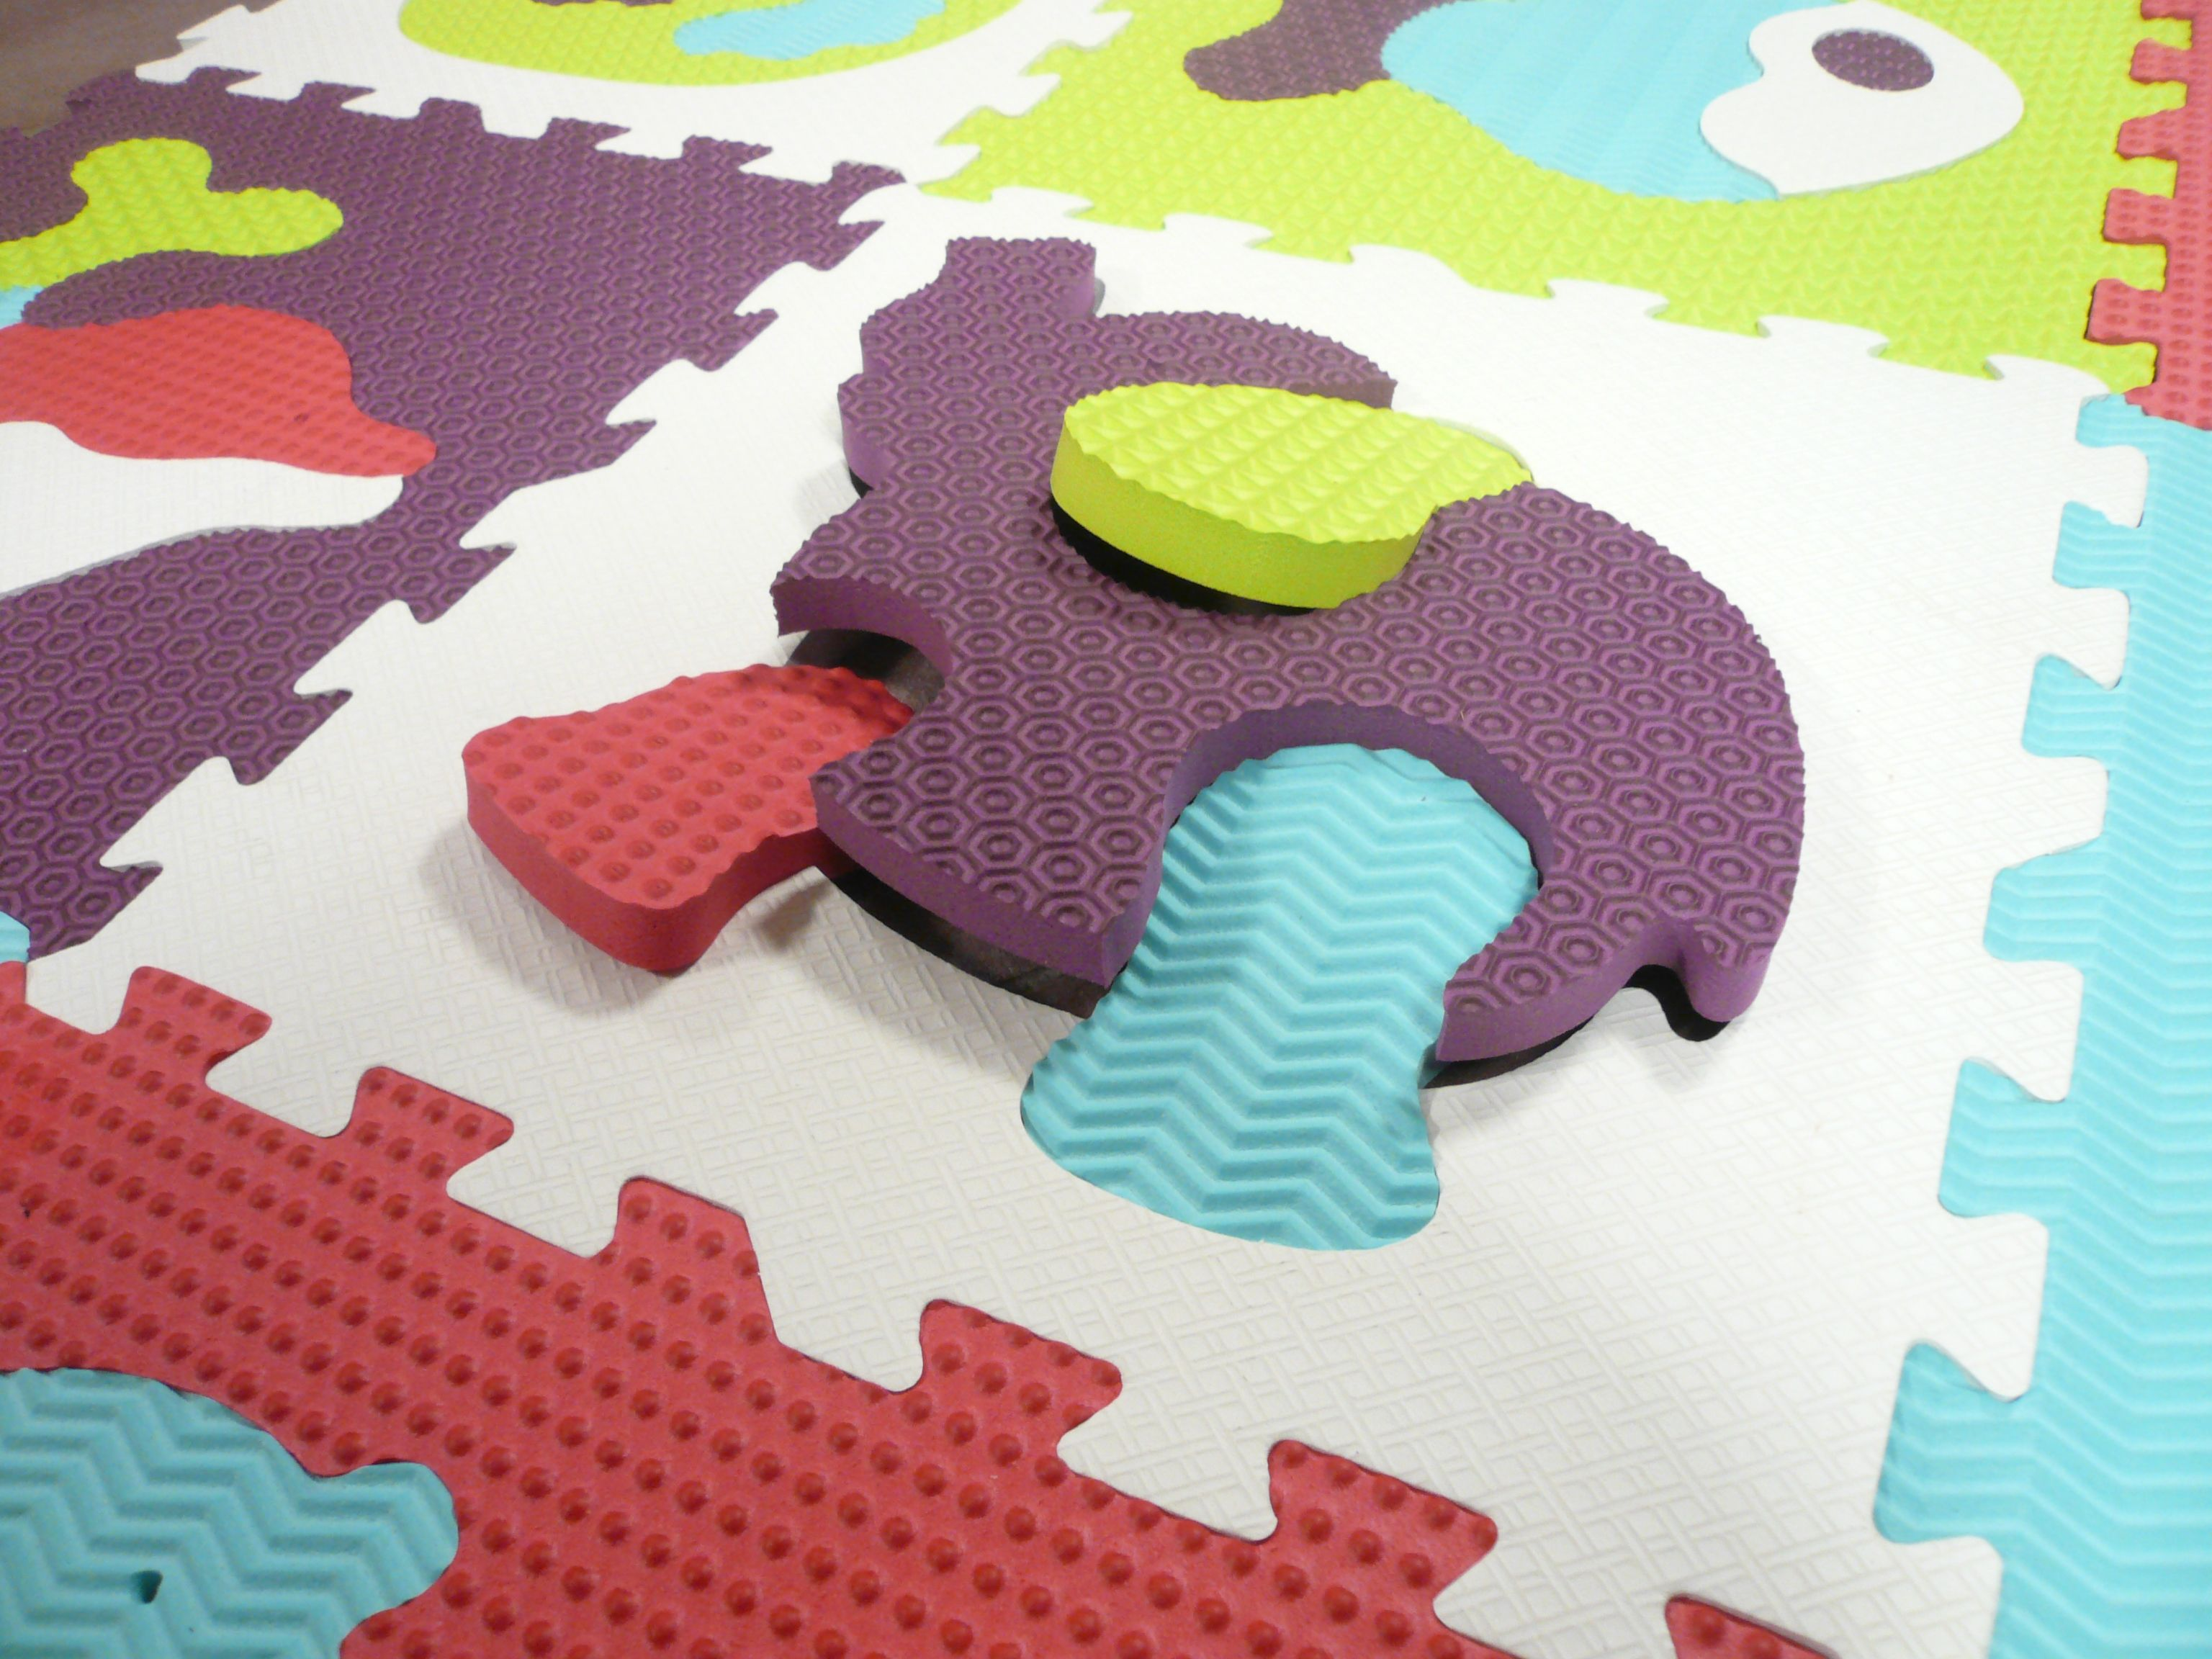 dalles animaux dallesmousse tapis